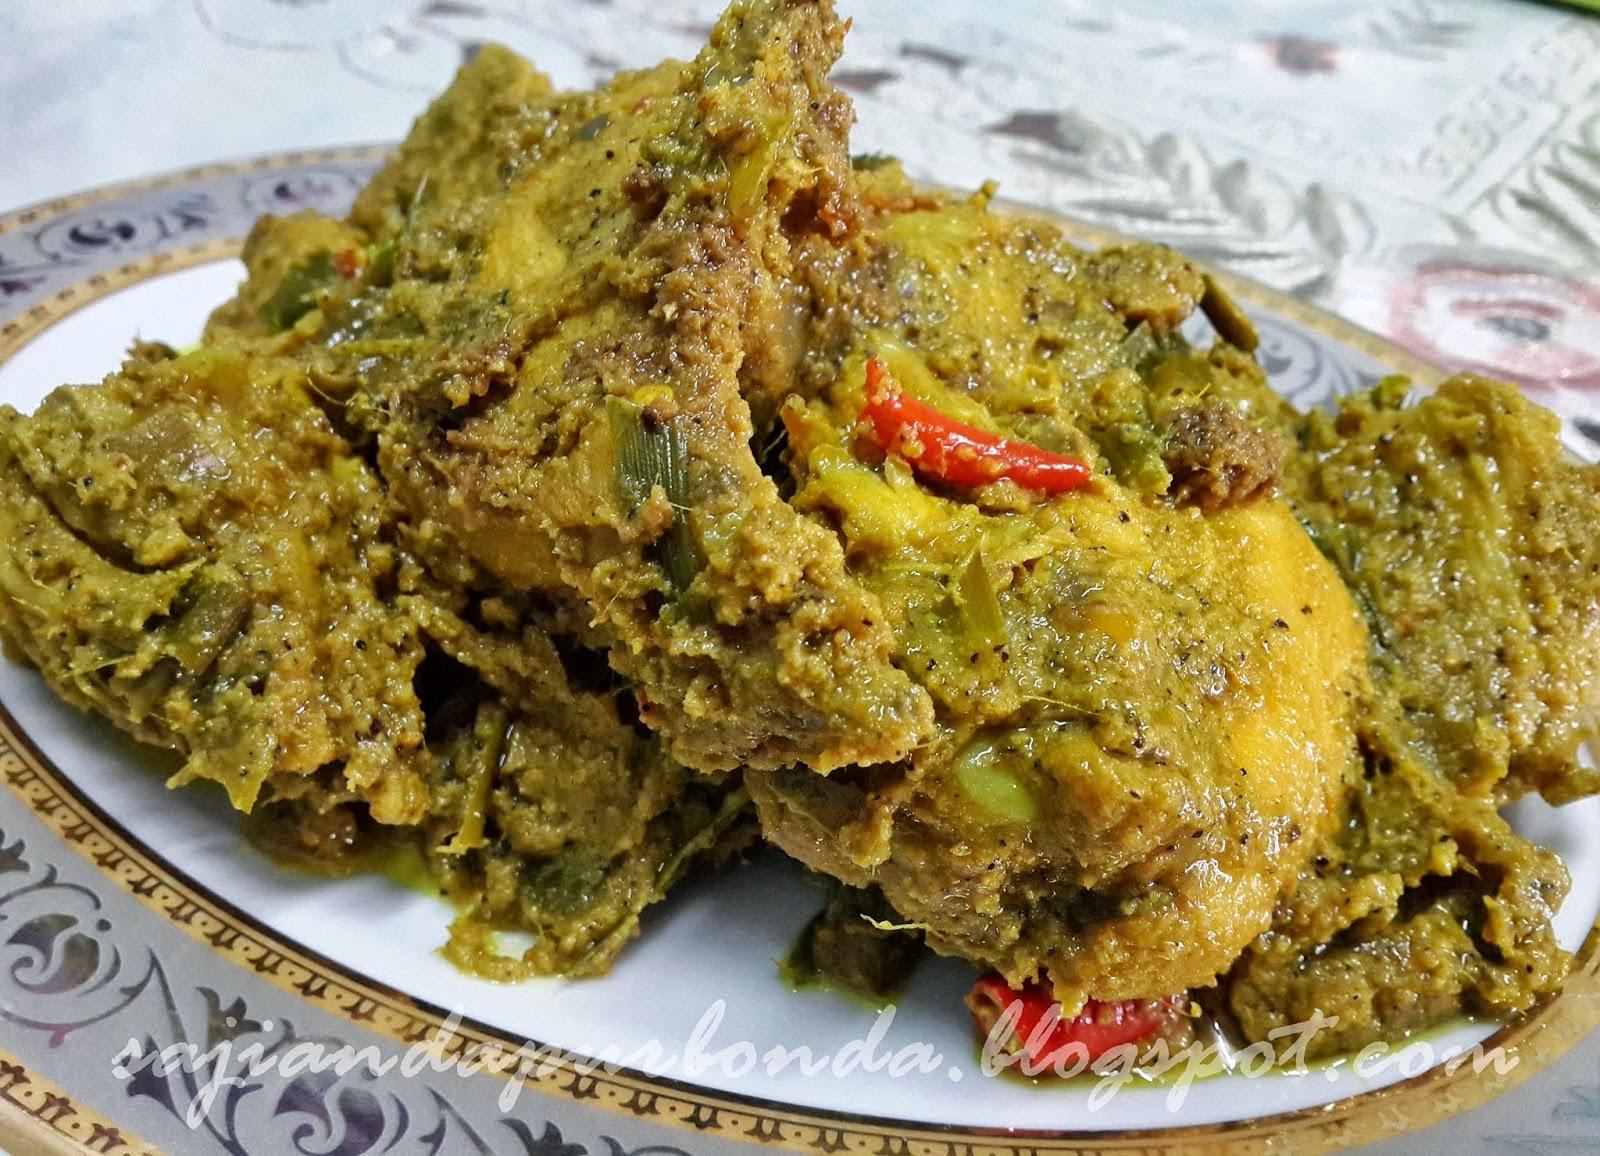 Sajian Dapur Bonda Nasi Kuning | Share The Knownledge